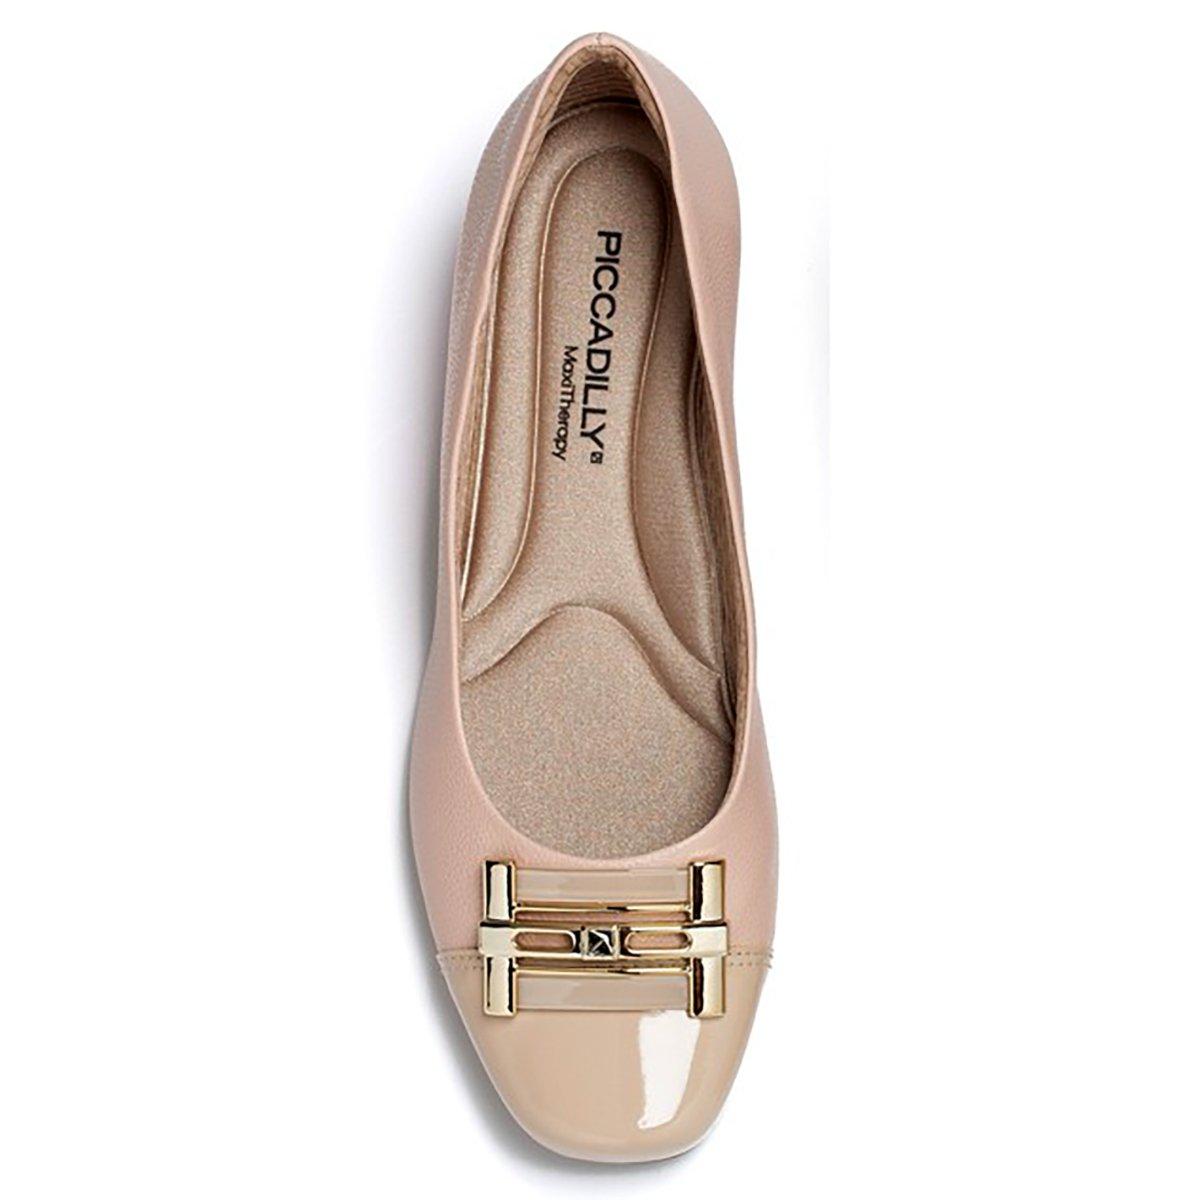 6e7620e228 Sapato Piccadilly Confort Bico Quadrado Bege - Compre Agora